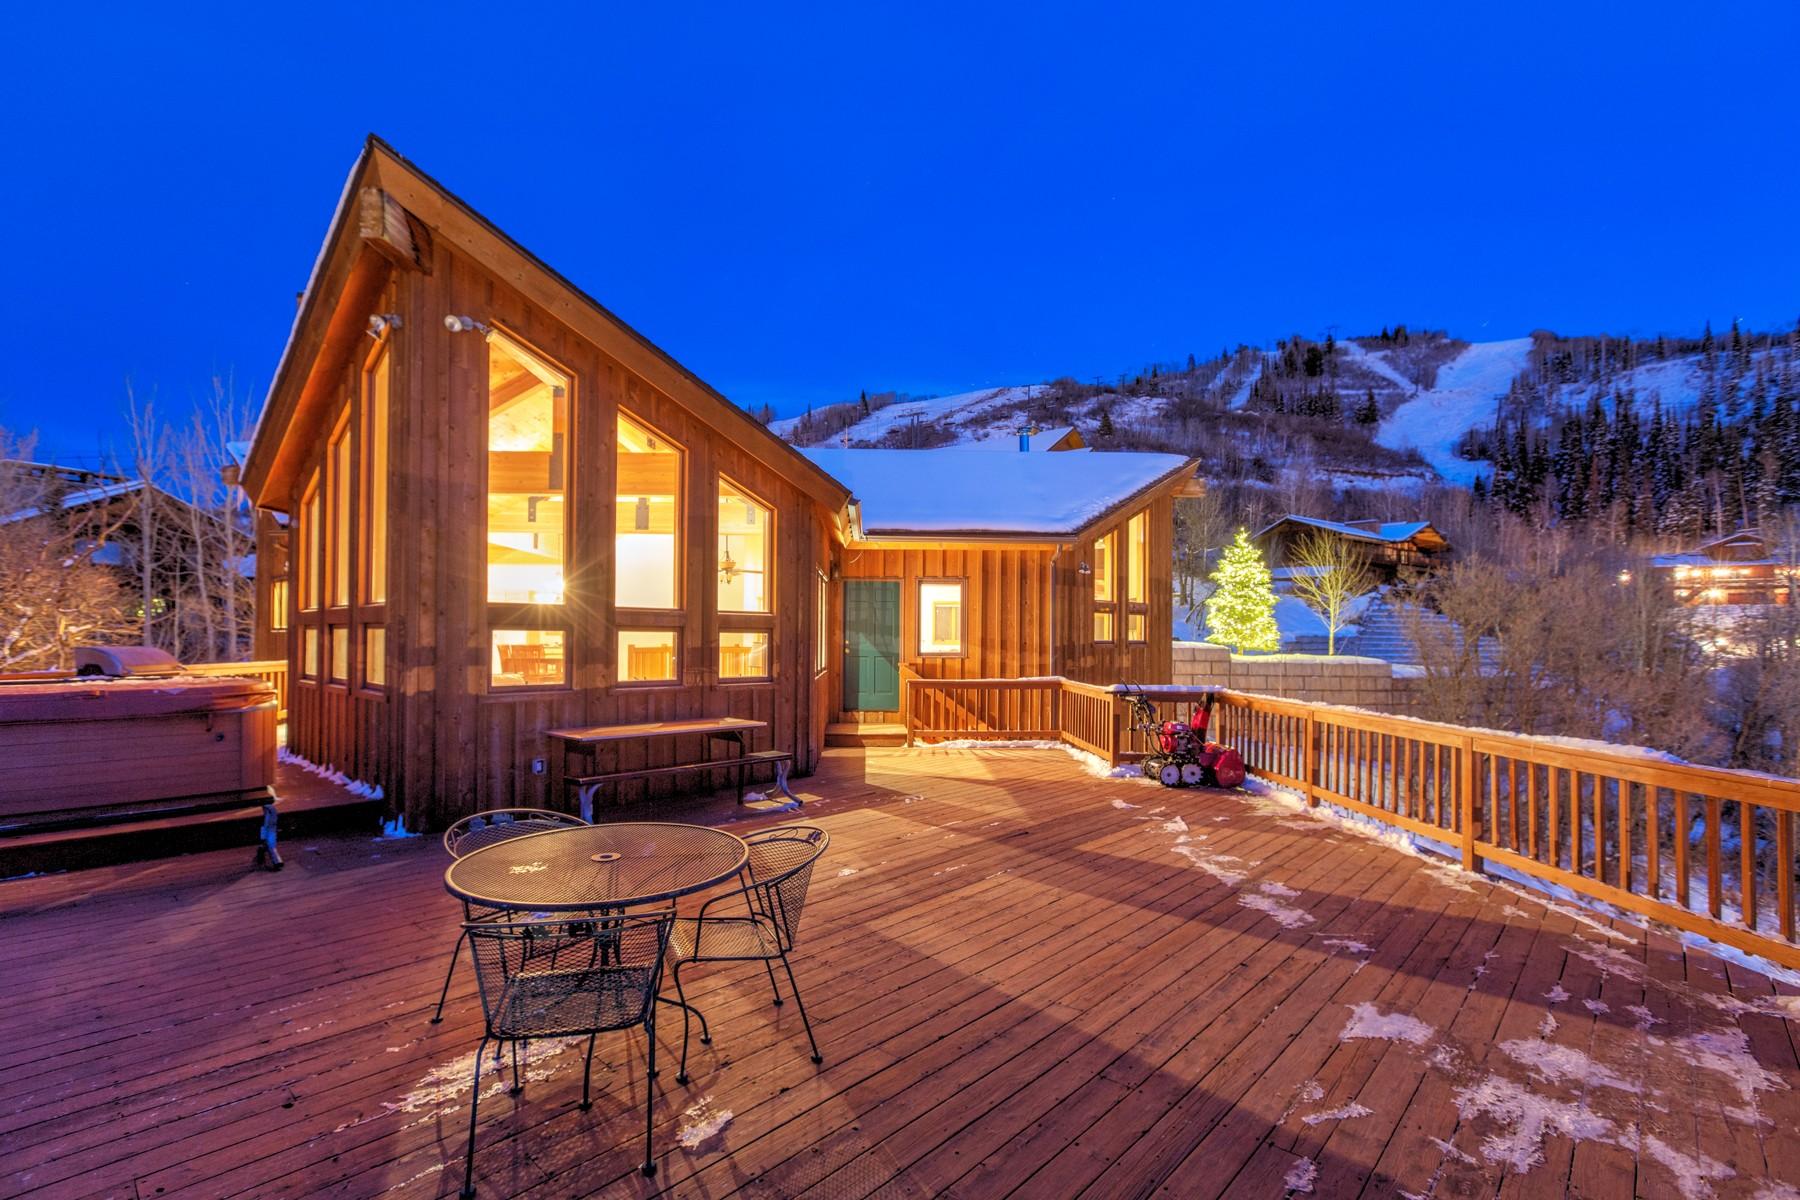 2462 Ski Trail Ln, Steamboat Springs, CO 80487